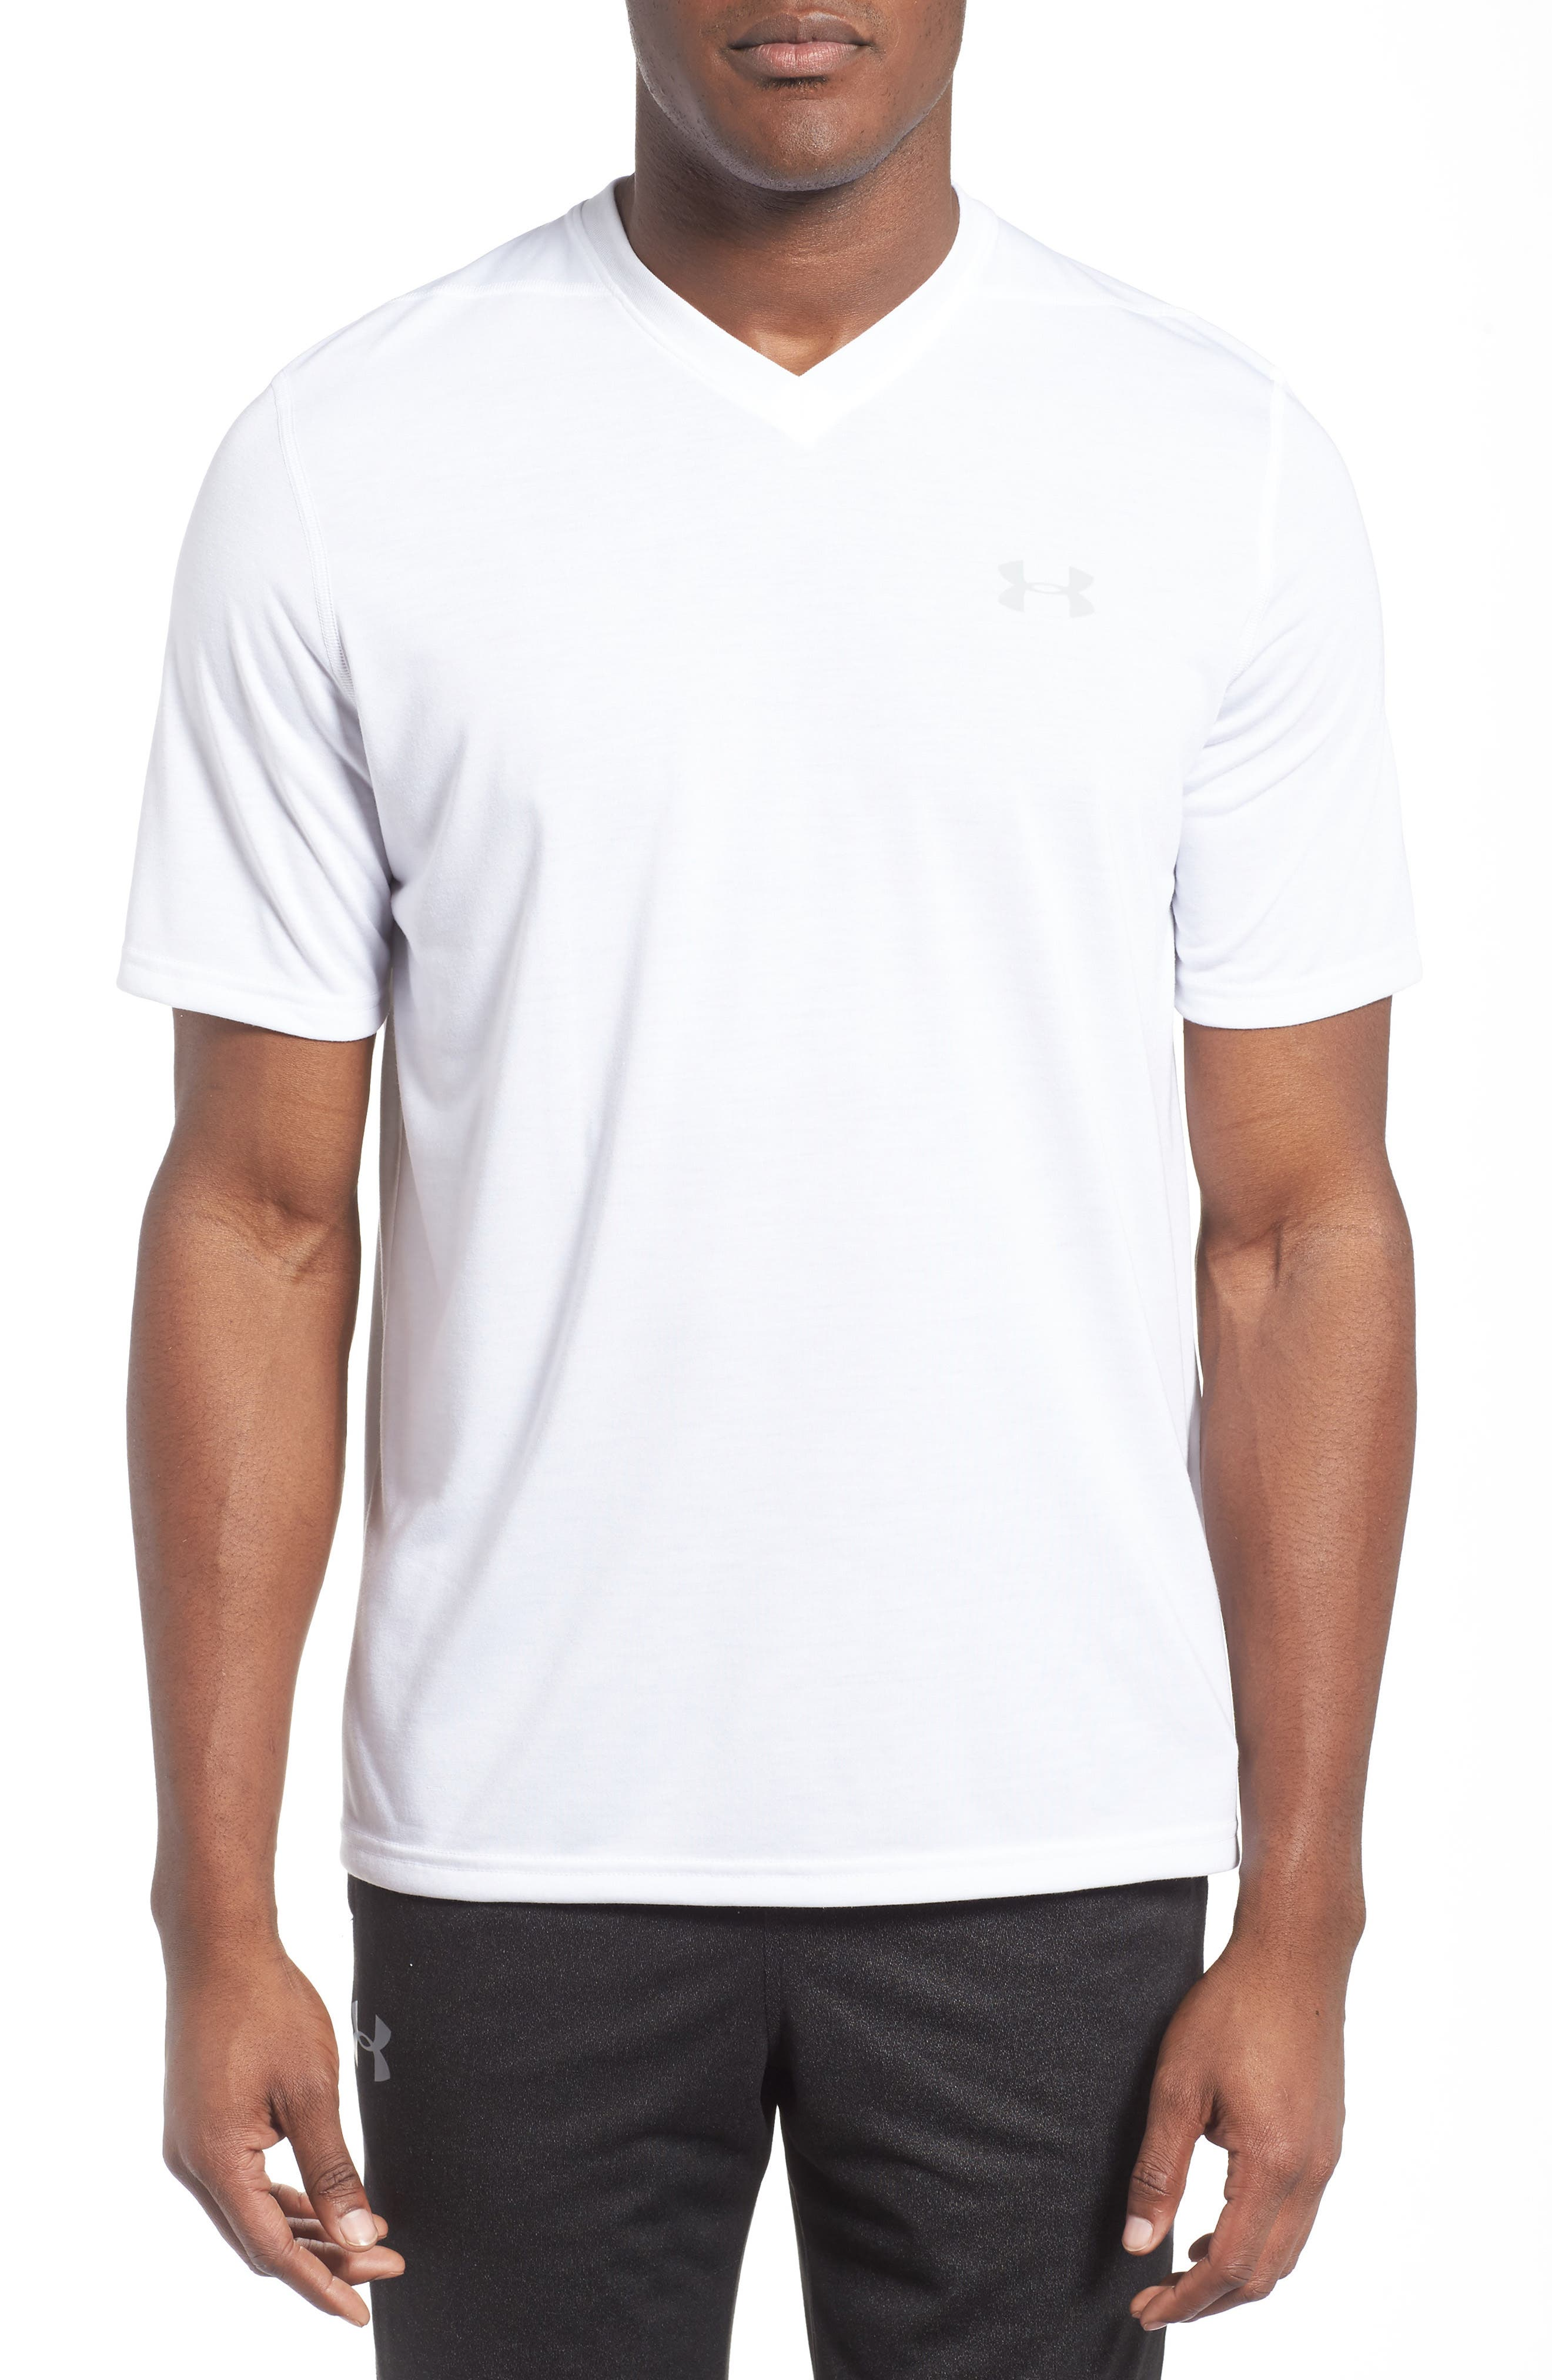 Main Image - Under Armour Regular Fit Threadborne T-Shirt